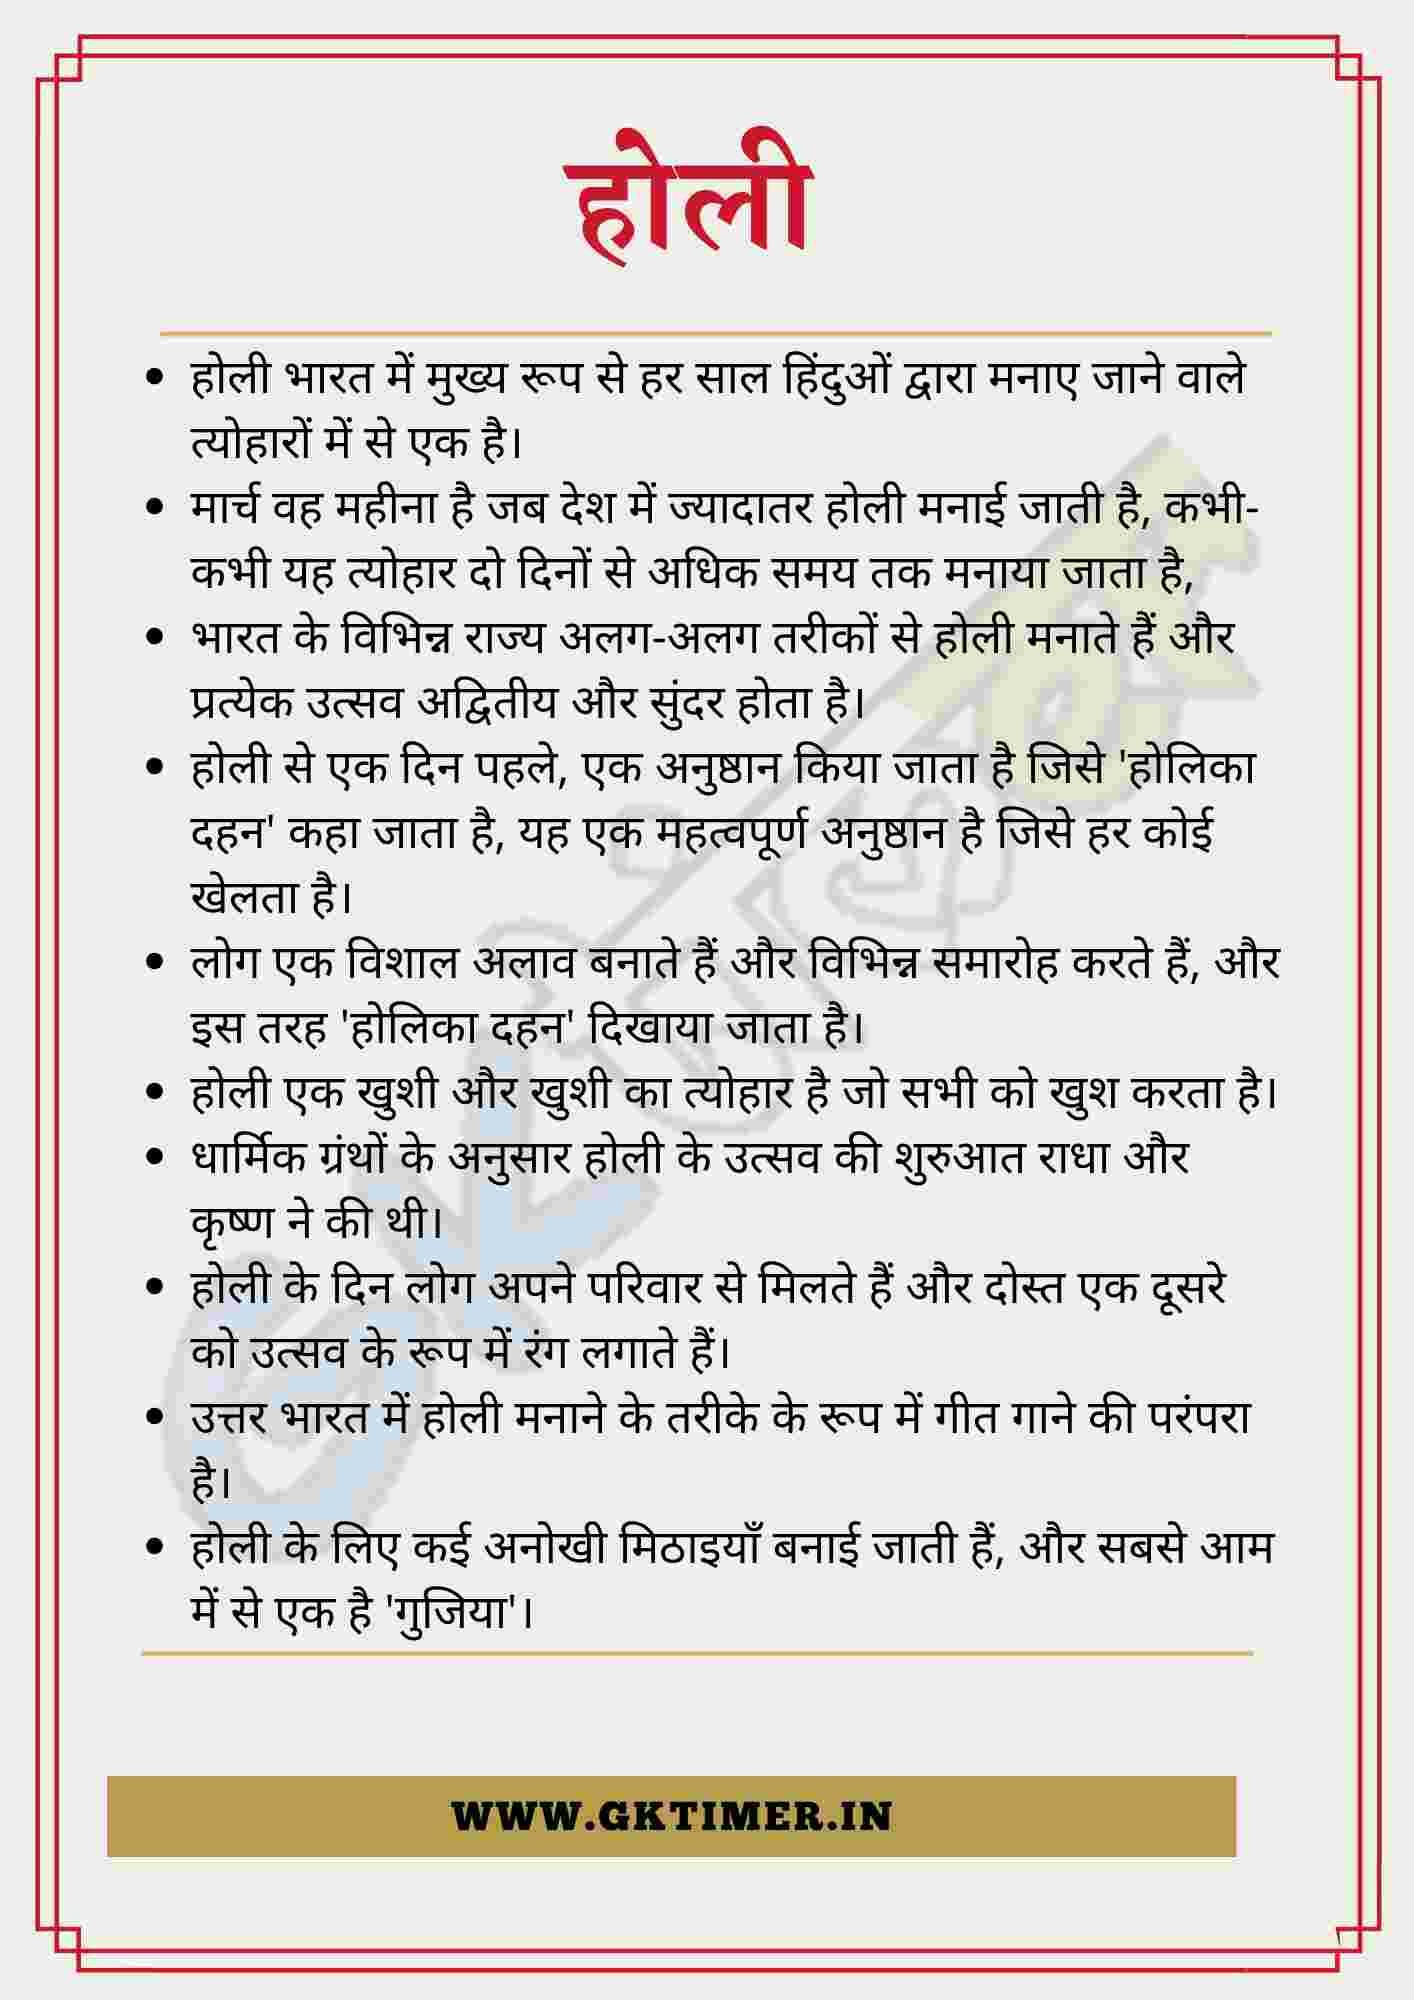 होली पर निबंध | Holi Essay in Hindi | 10 Lines on Holi in Hindi